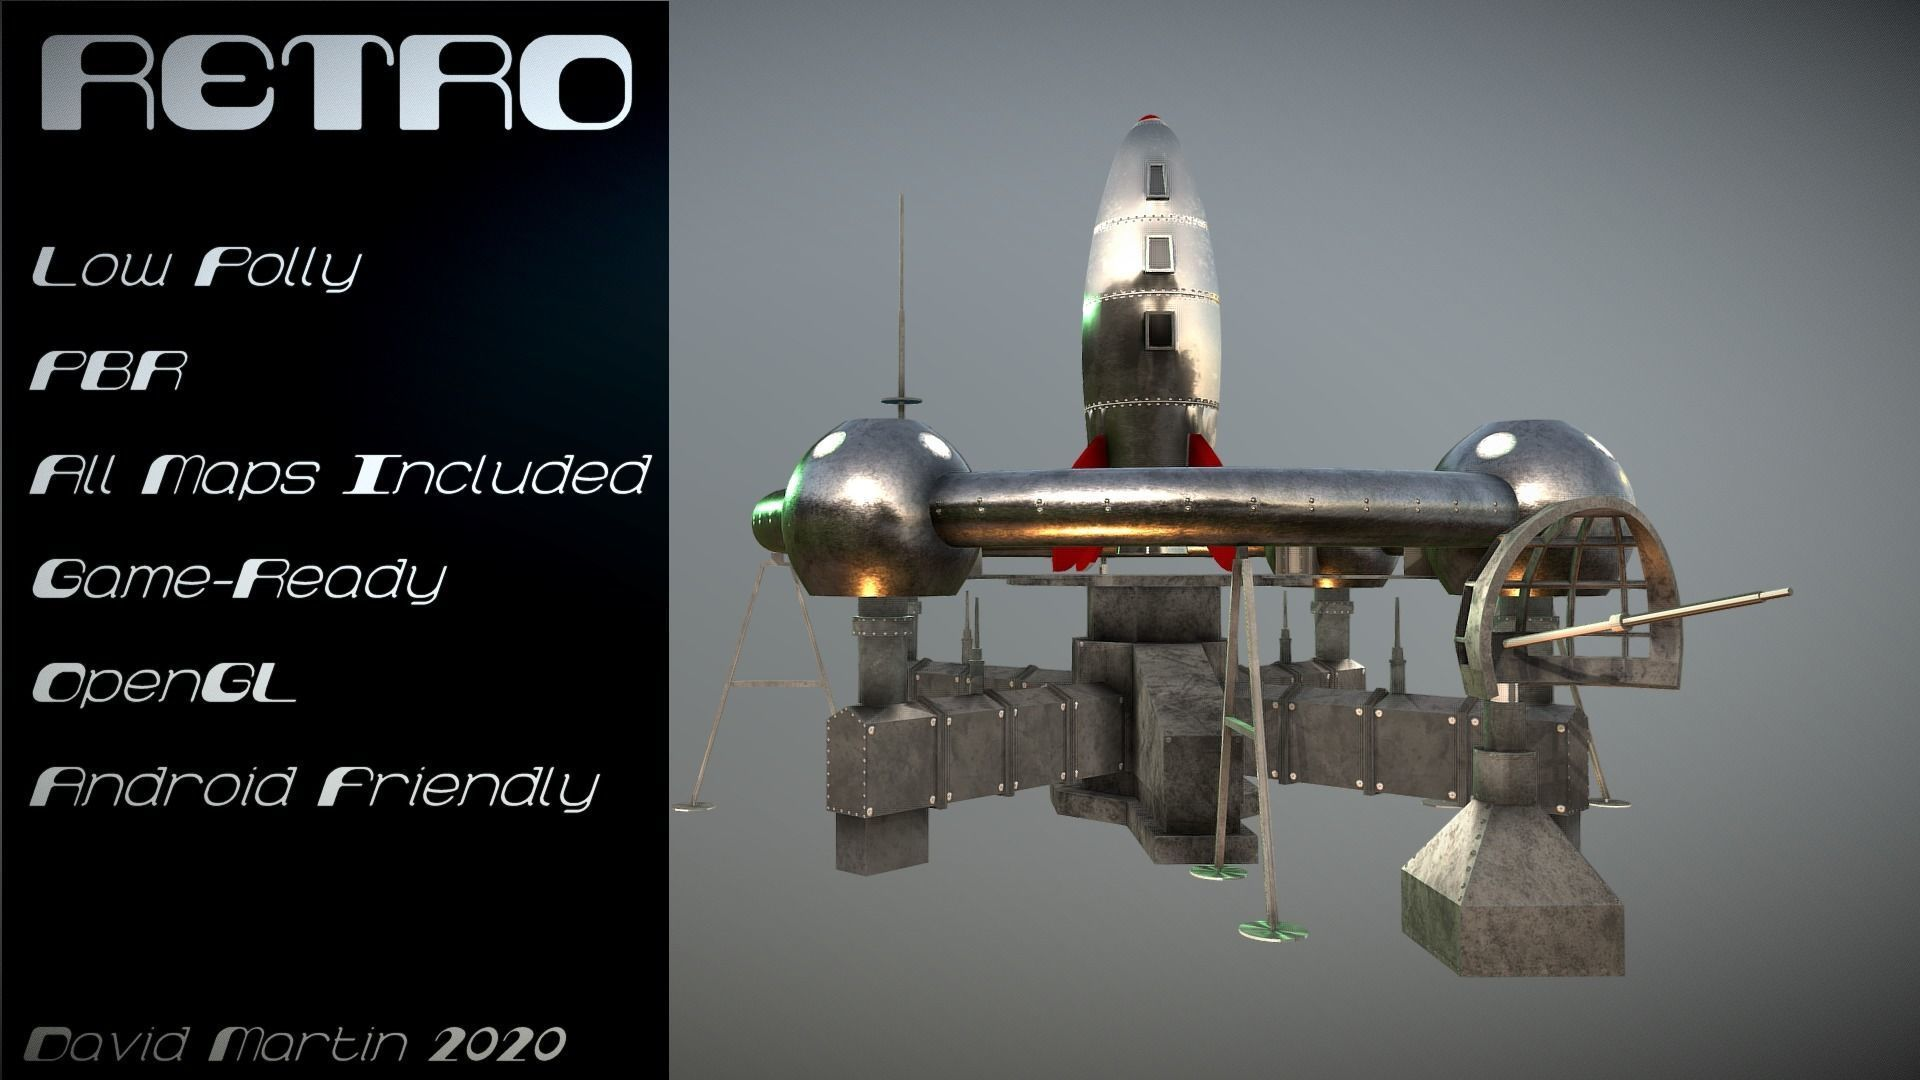 Retro Sci-Fi Moonbase